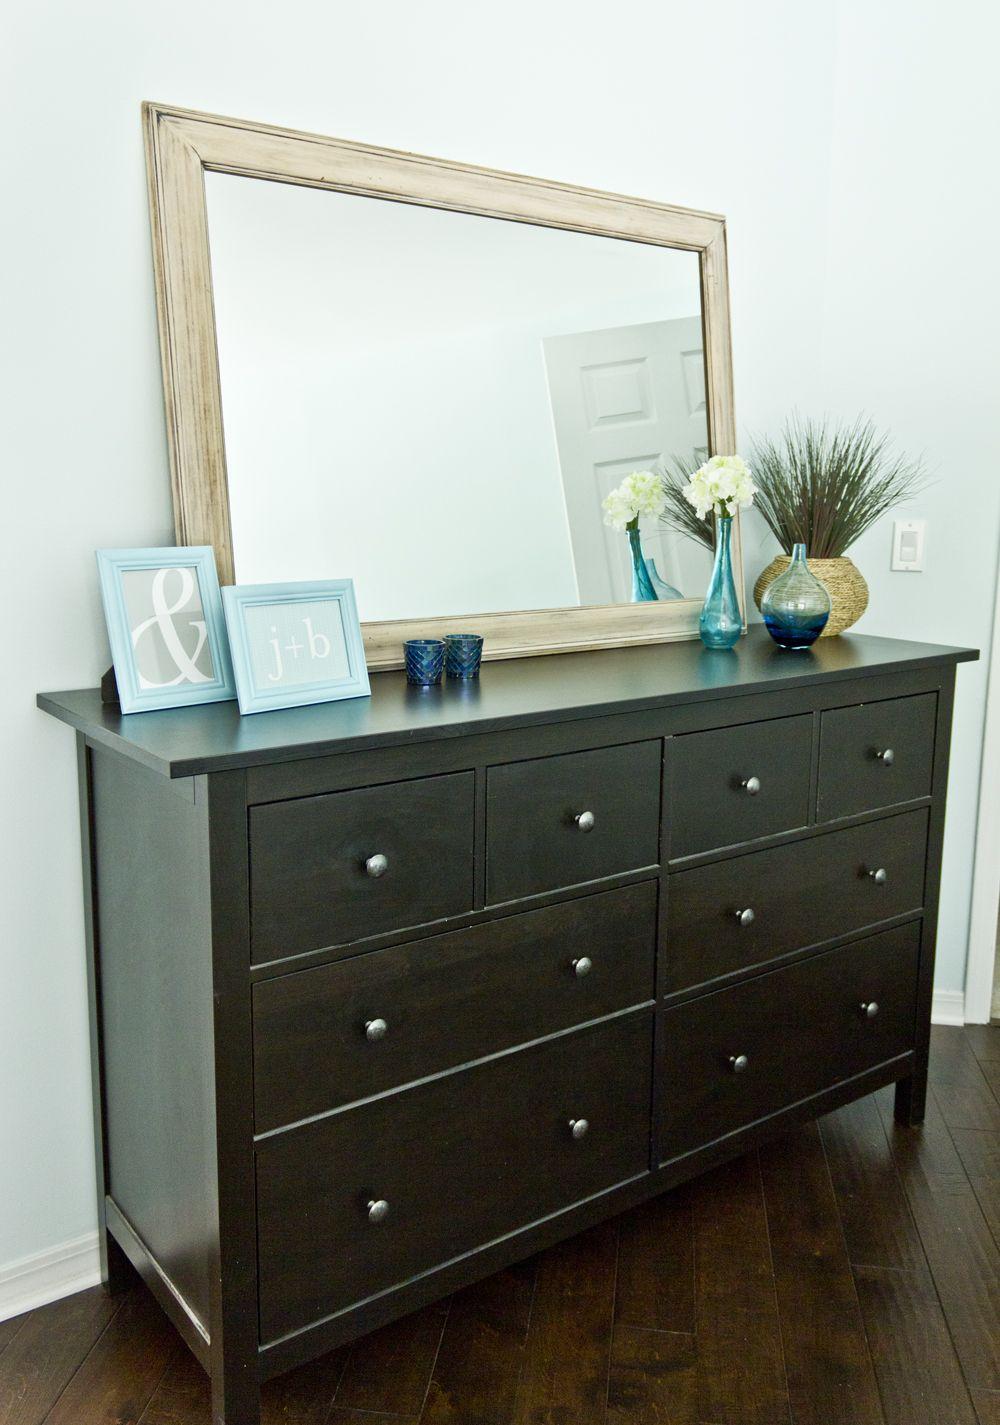 Ikea Hemnes Dresser Hack A Pinterest Challenge Project  # Muebles Reformados